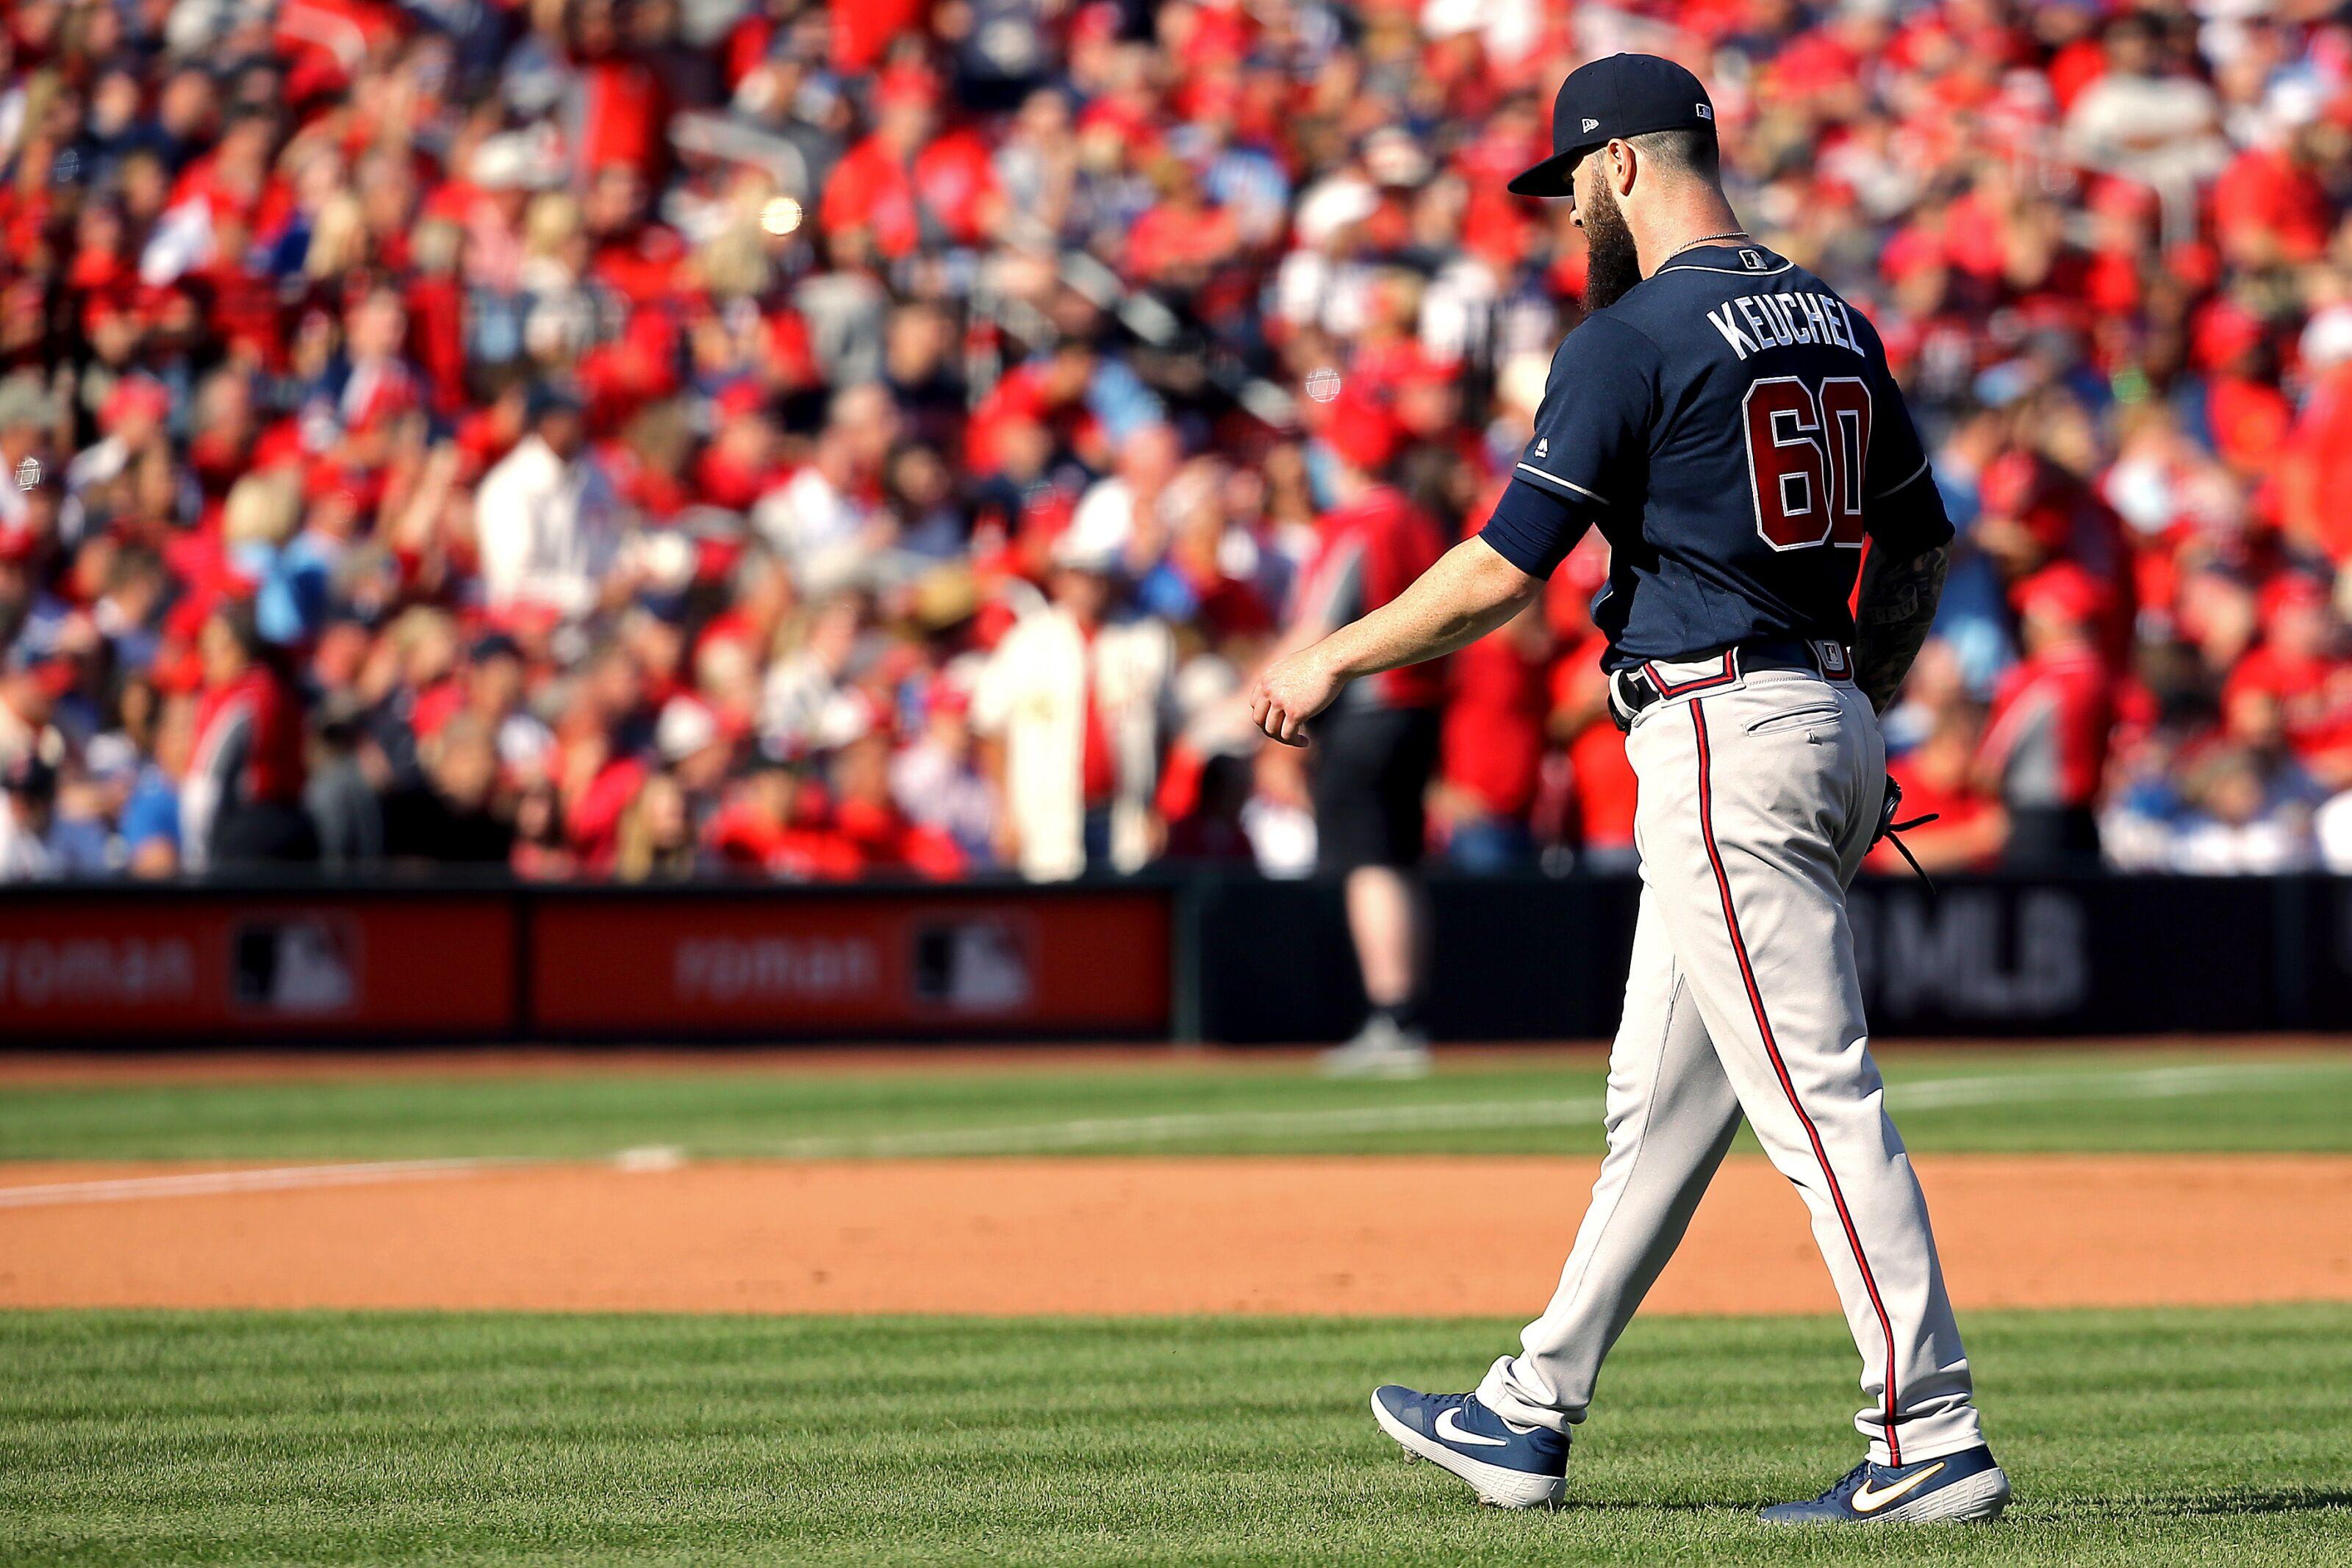 Cubs: Is Dallas Keuchel a possible replacement for Cole Hamels?